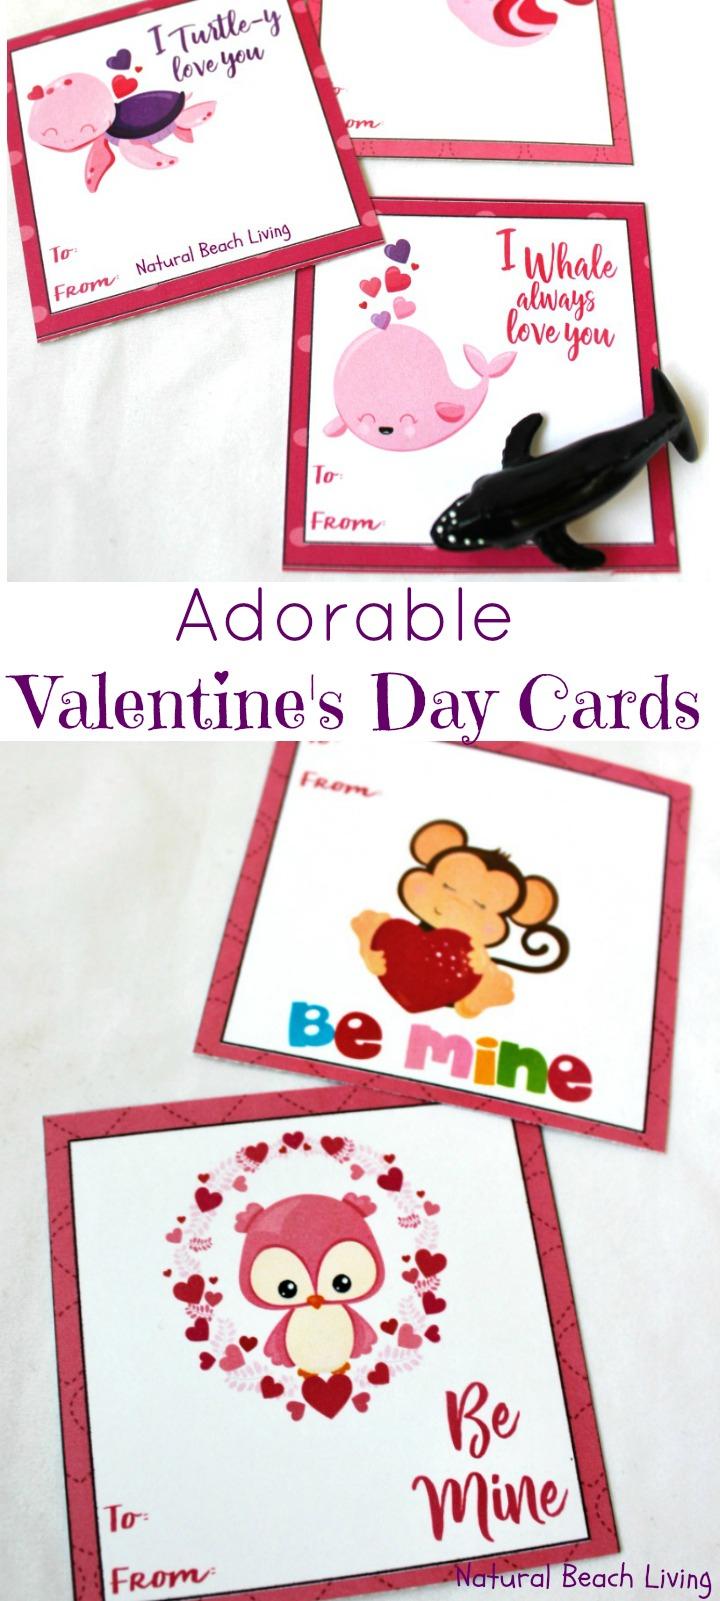 Adorable Preschool Valentine's Day Cards (Free Printables) - Natural - Free Printable Valentine Cards For Preschoolers